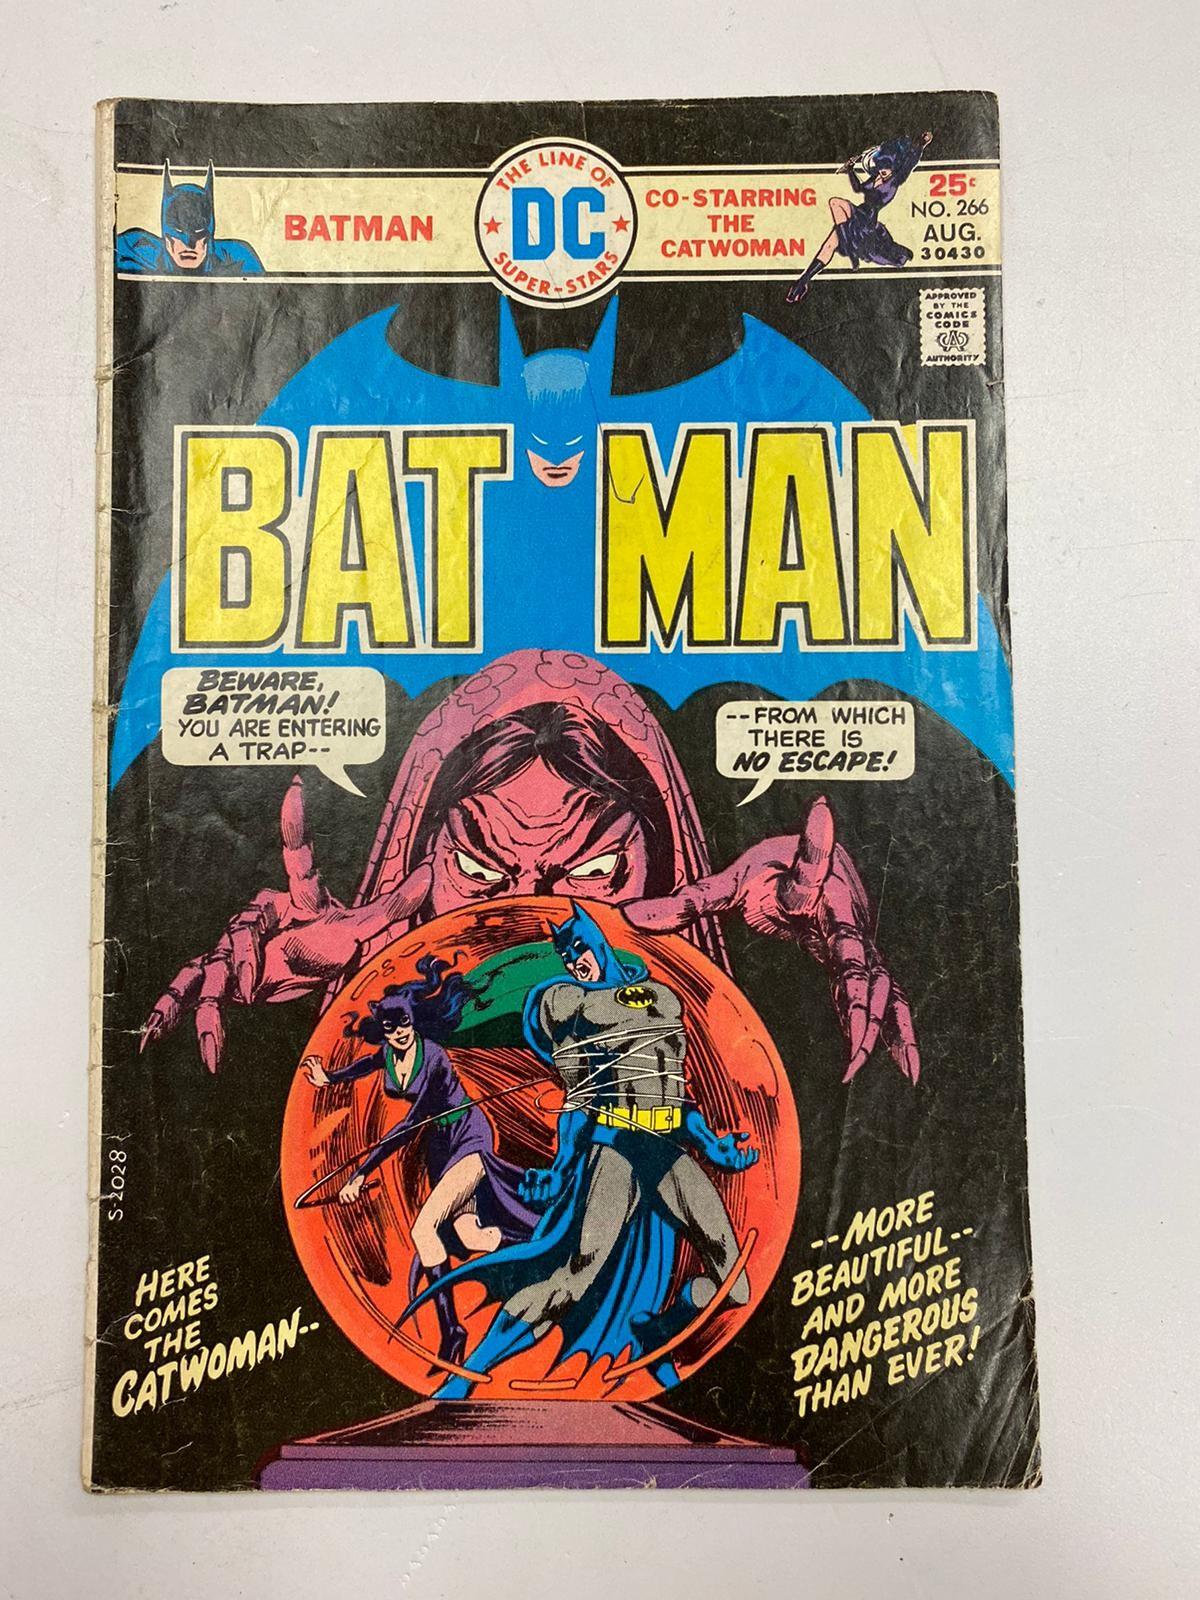 Vintage DC Comics - Batman (N0.266) in good condition.